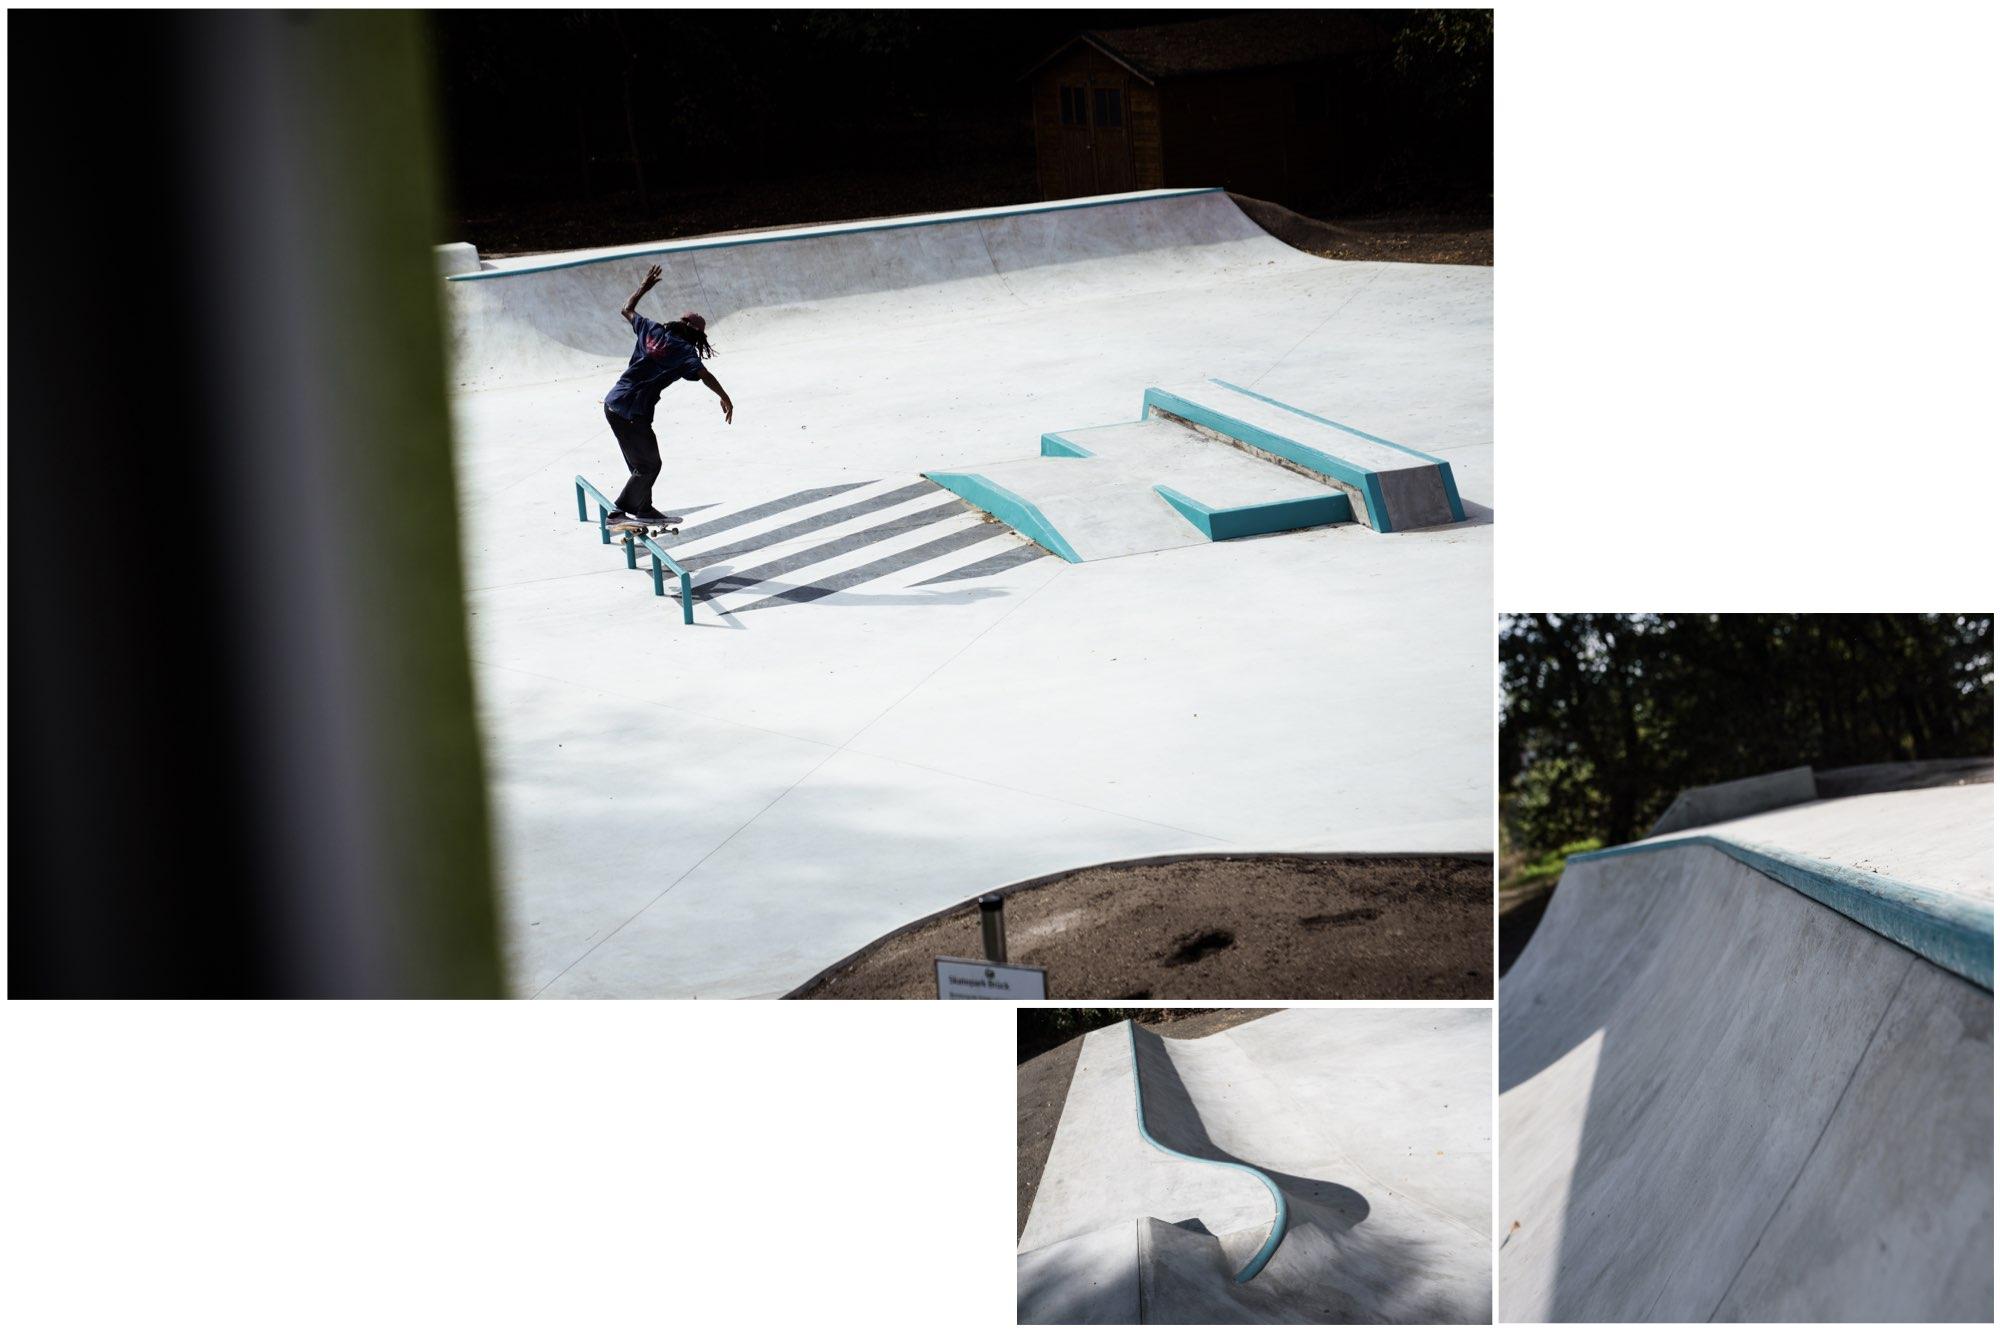 lndskt_skatepark_planung_brueck_kanya_spani